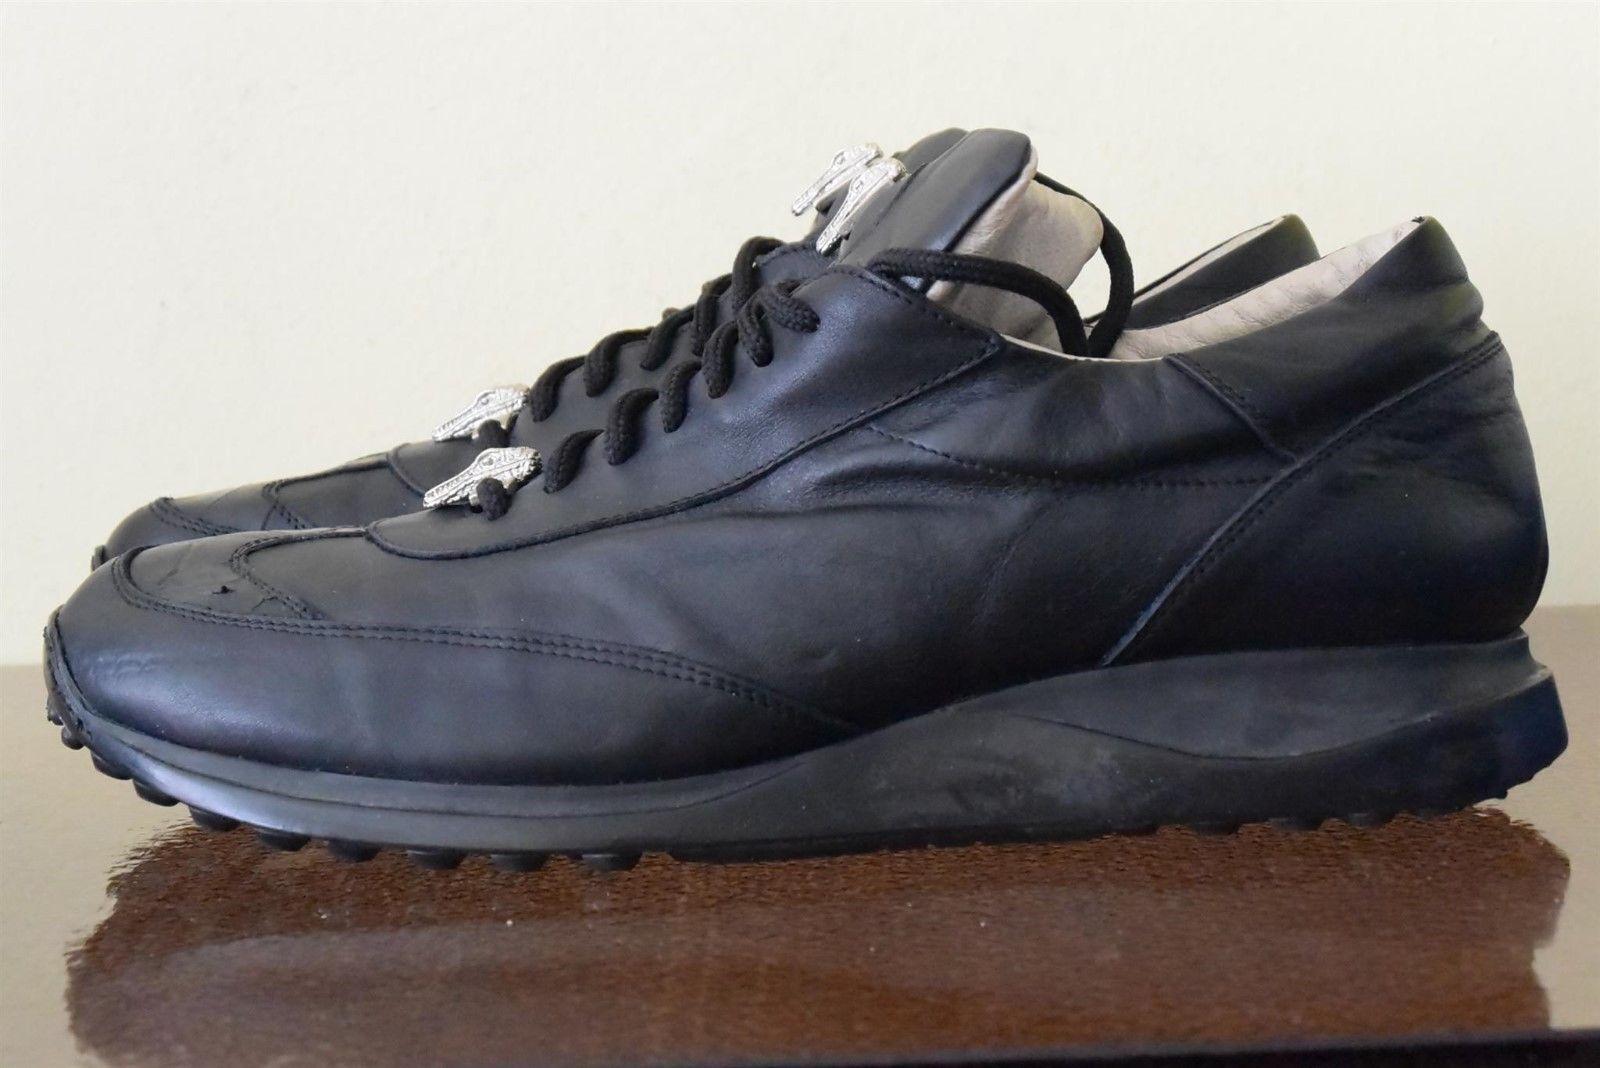 a1a70c13ec7 Mauri (45) 11 Sz Sneakers Italian Leather Crocodile Black ...